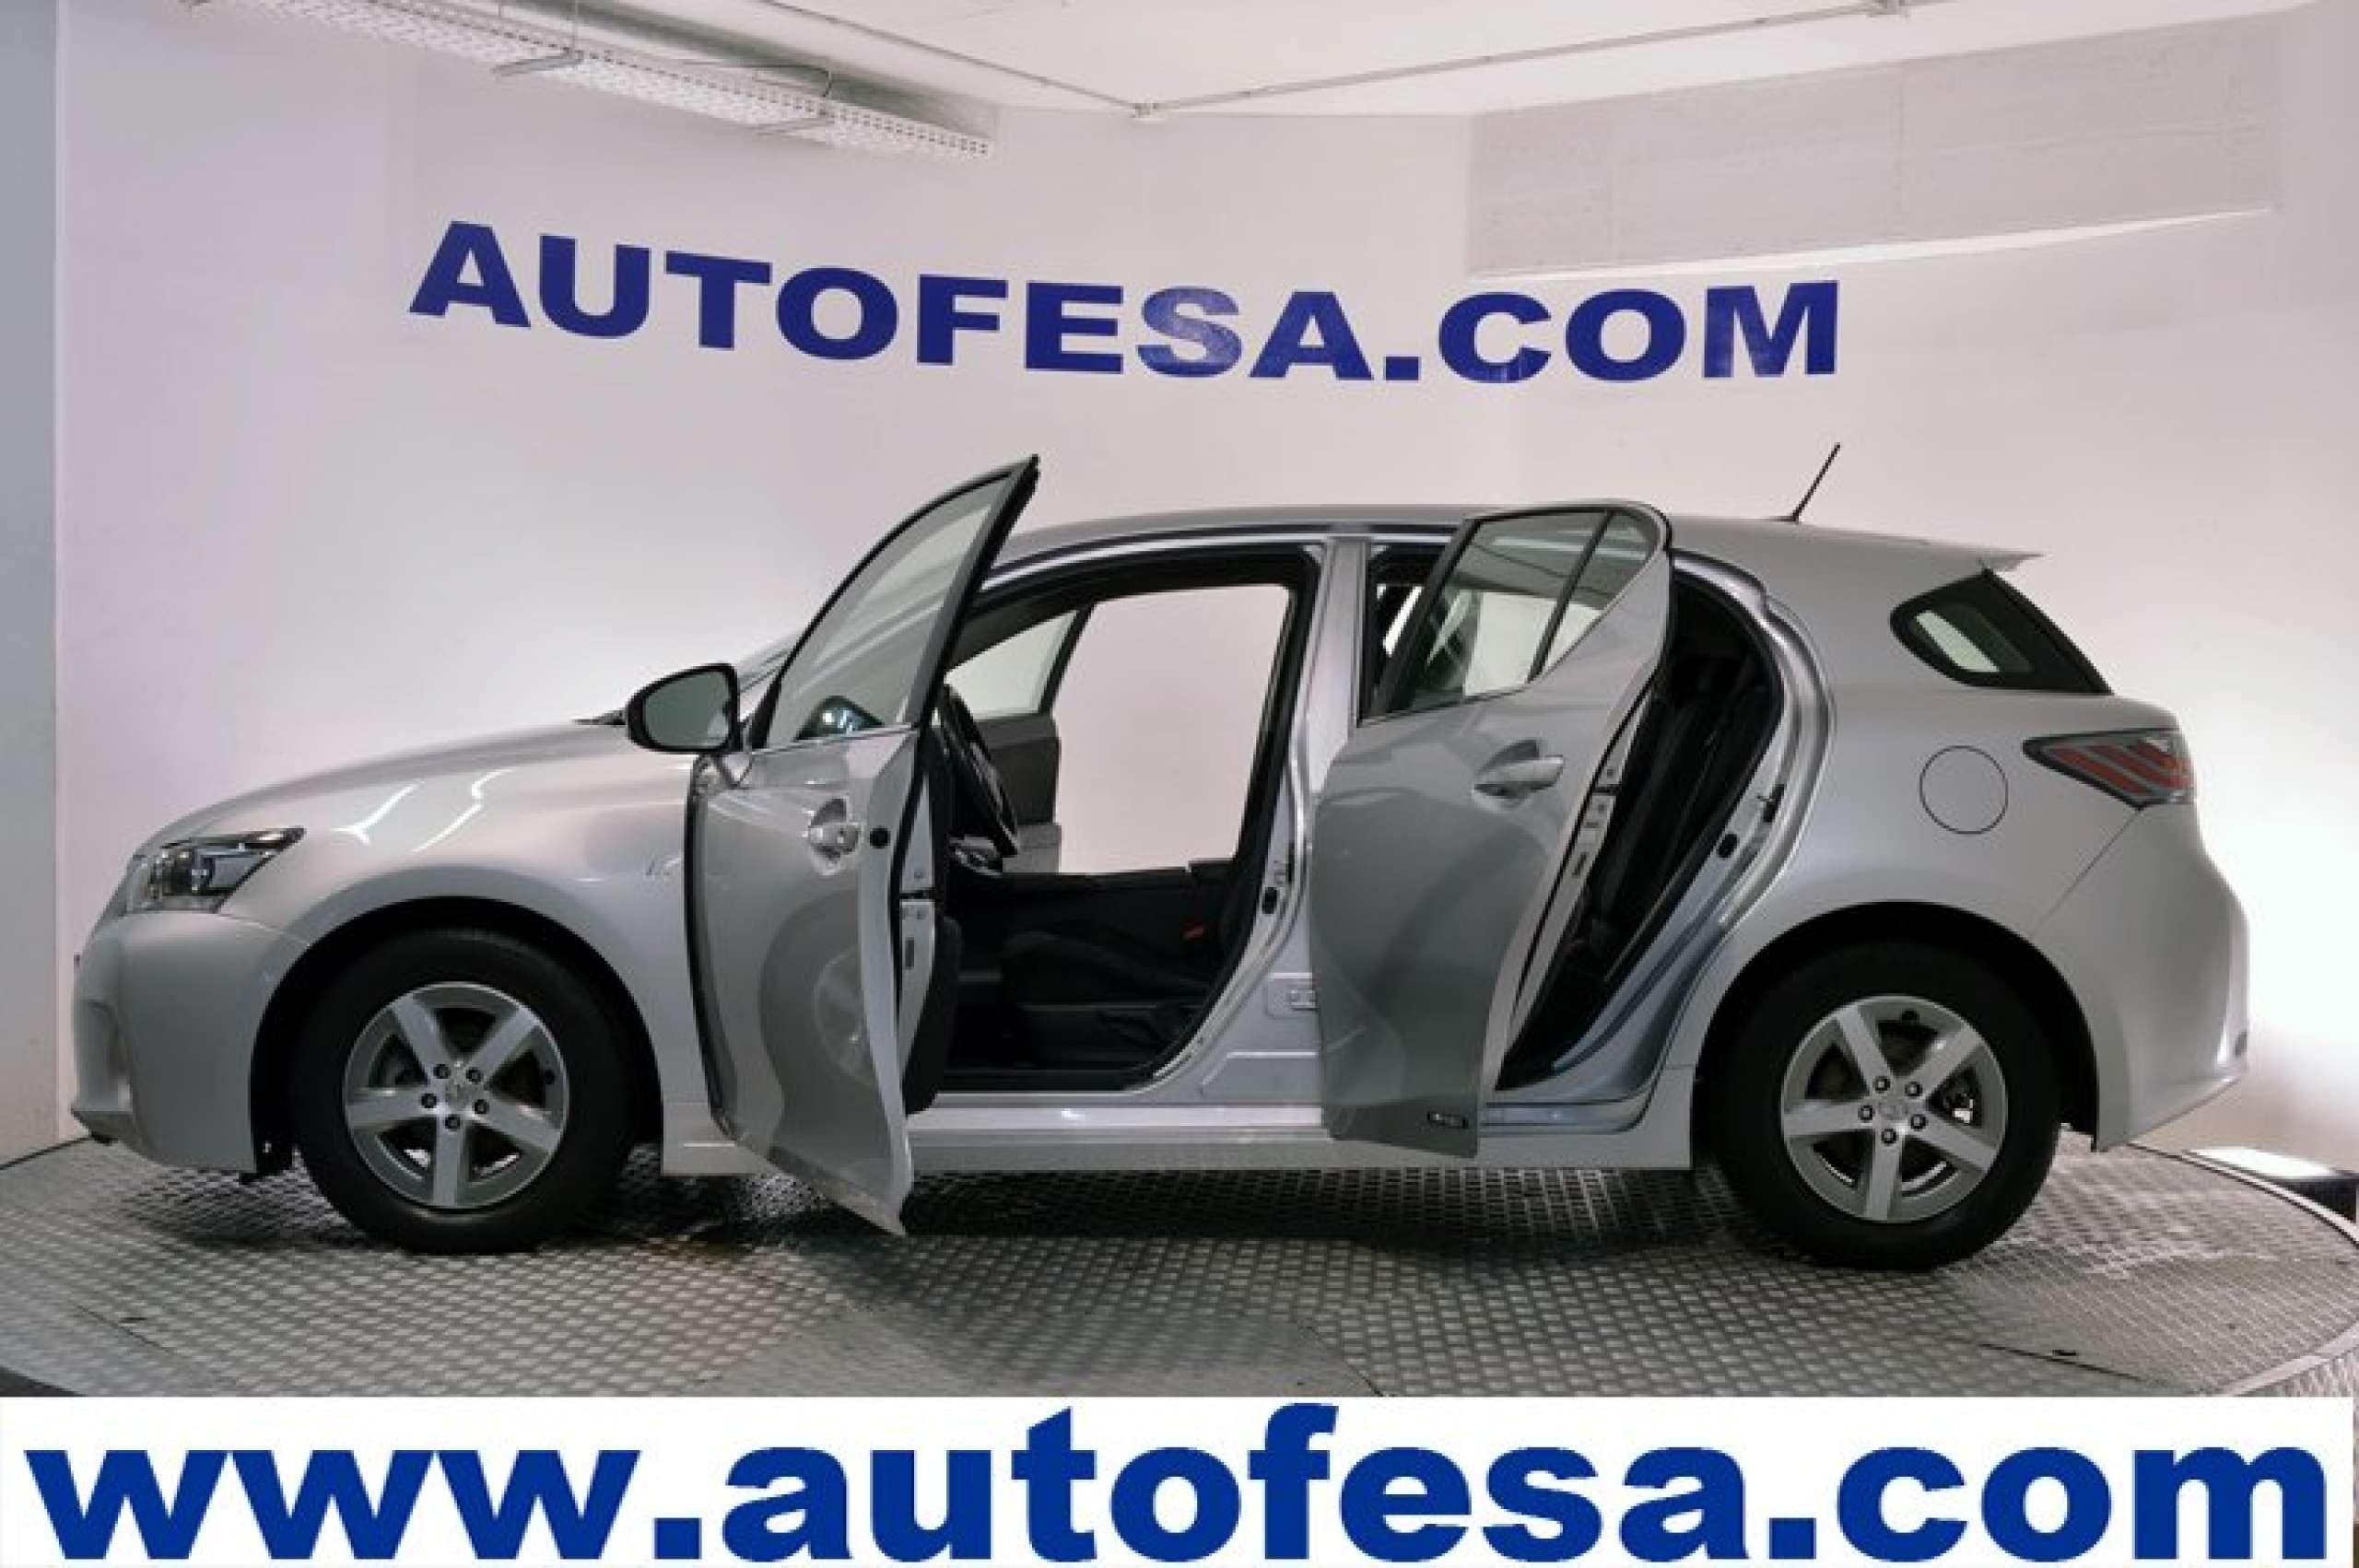 Lexus Ct 200h 1.8 136cv Eco Auto 5p - Foto 13